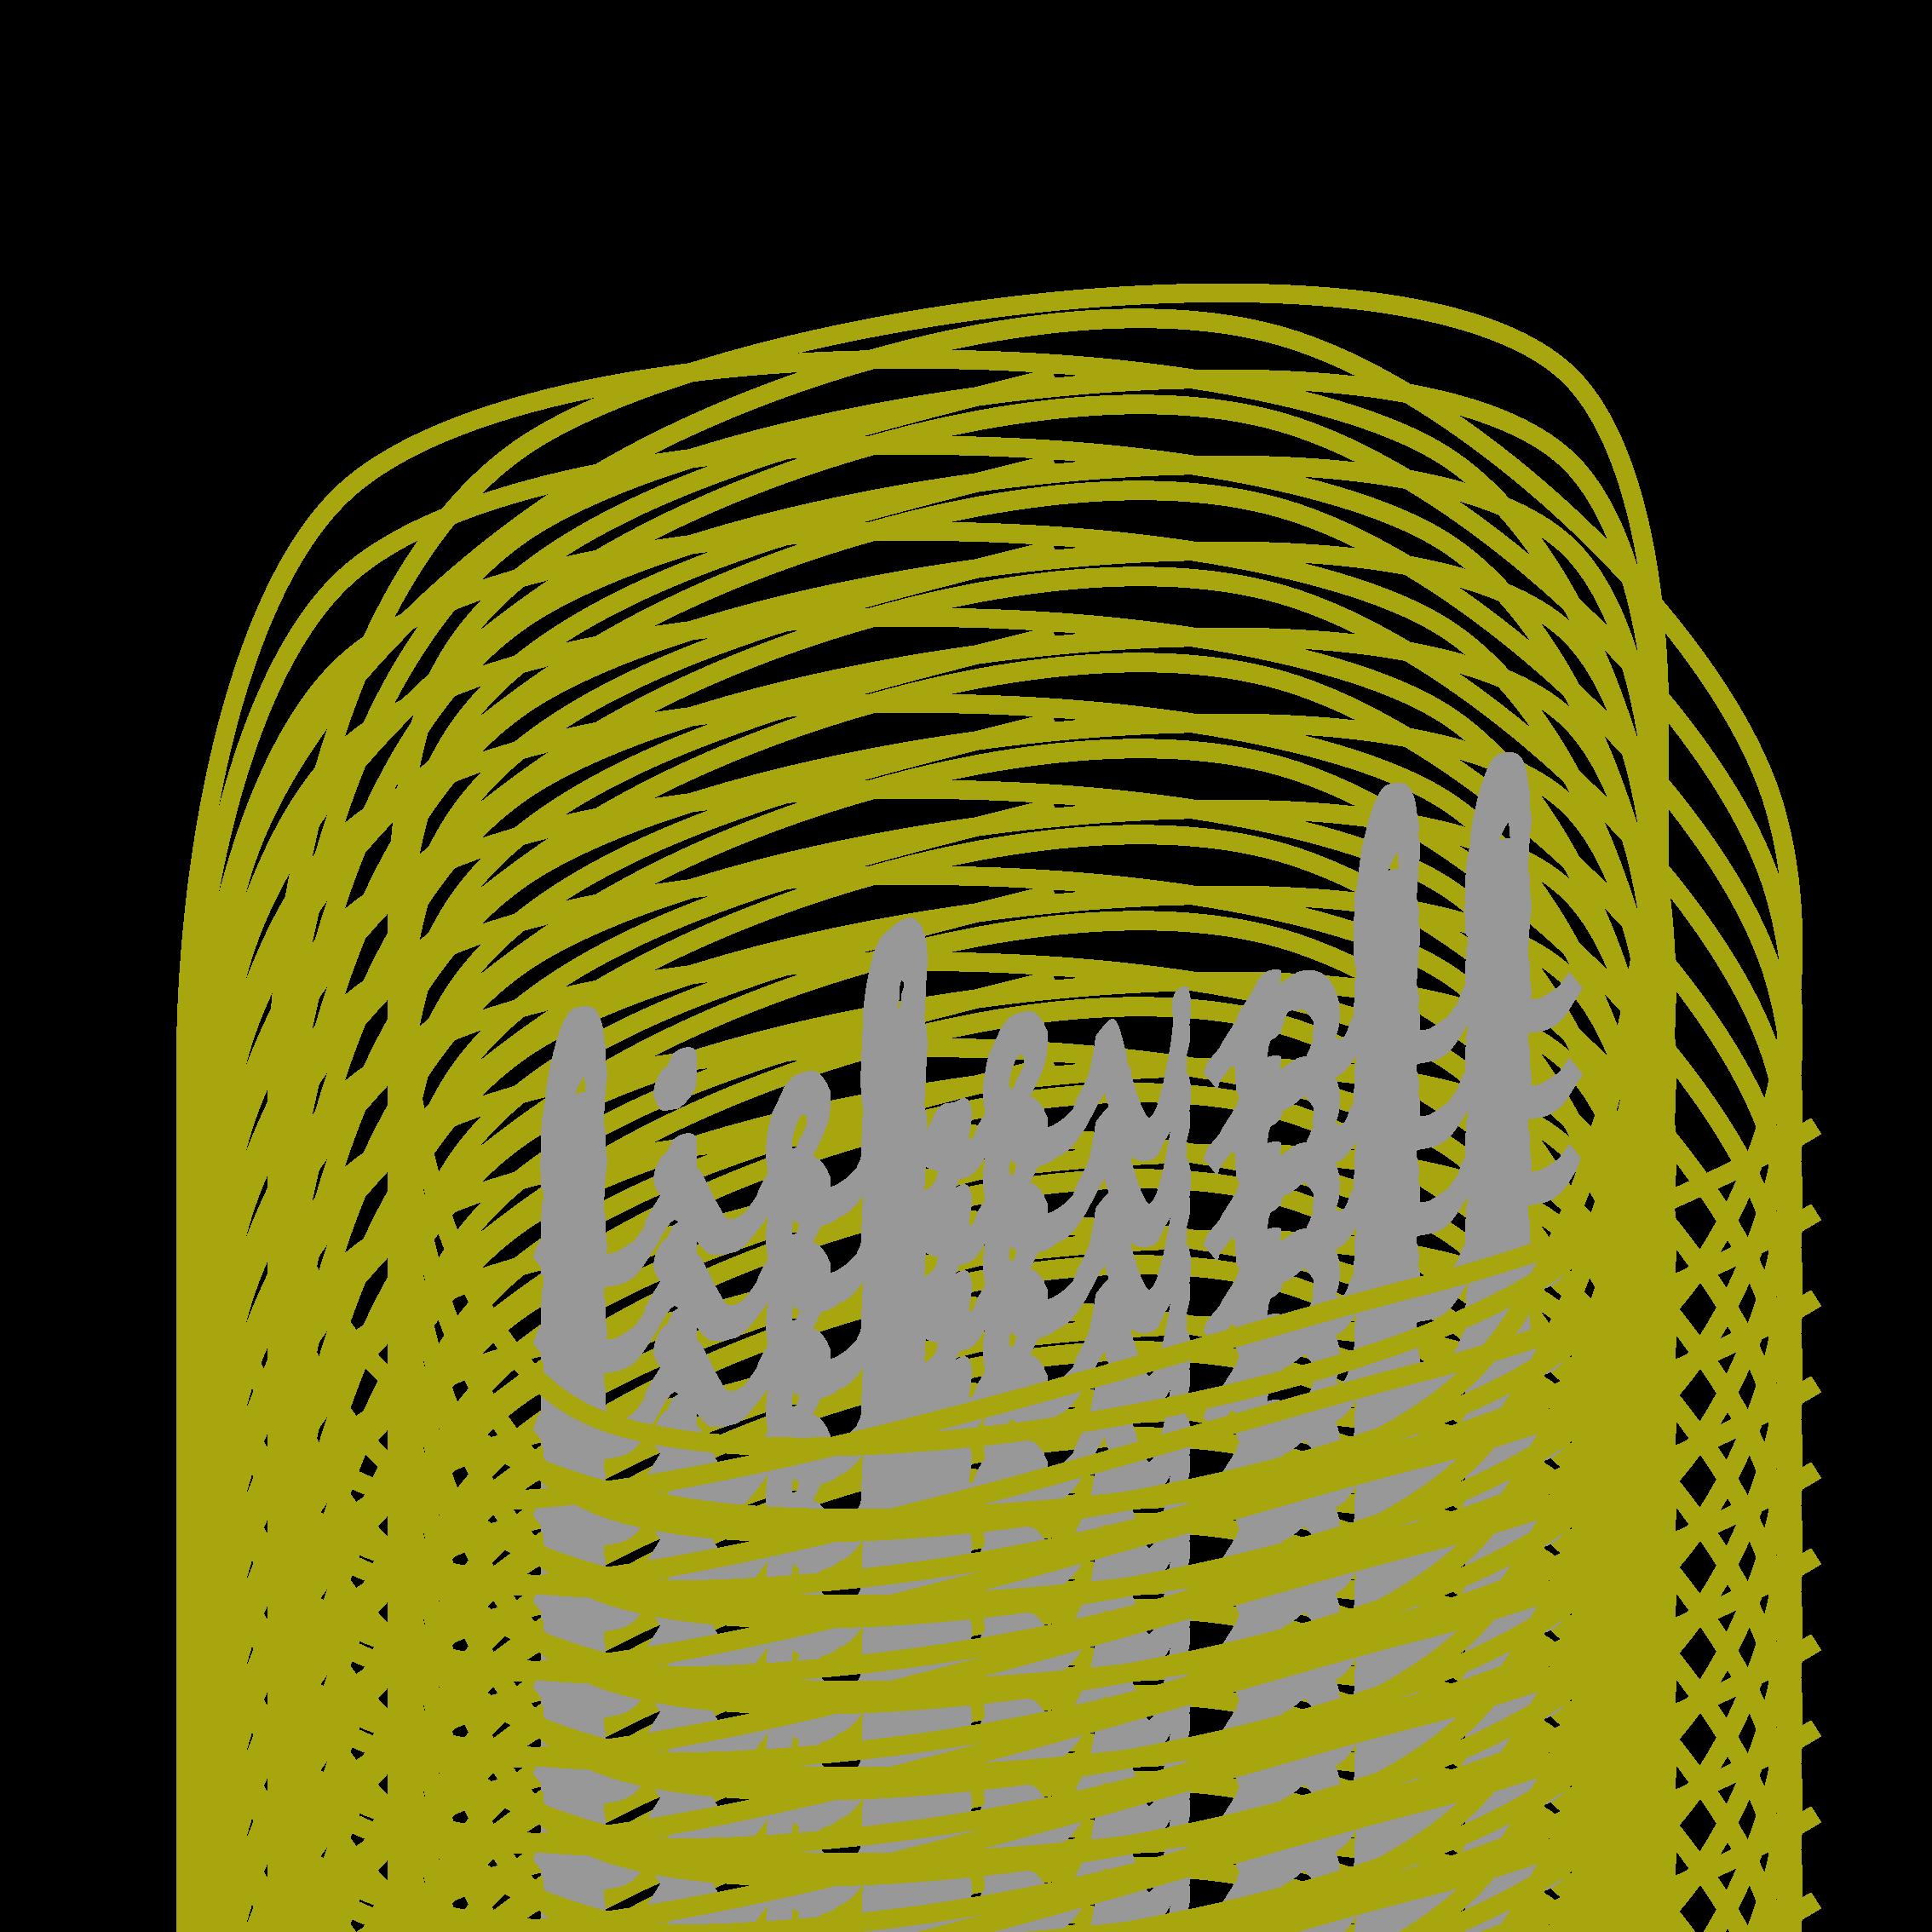 logo_liebevoll-01